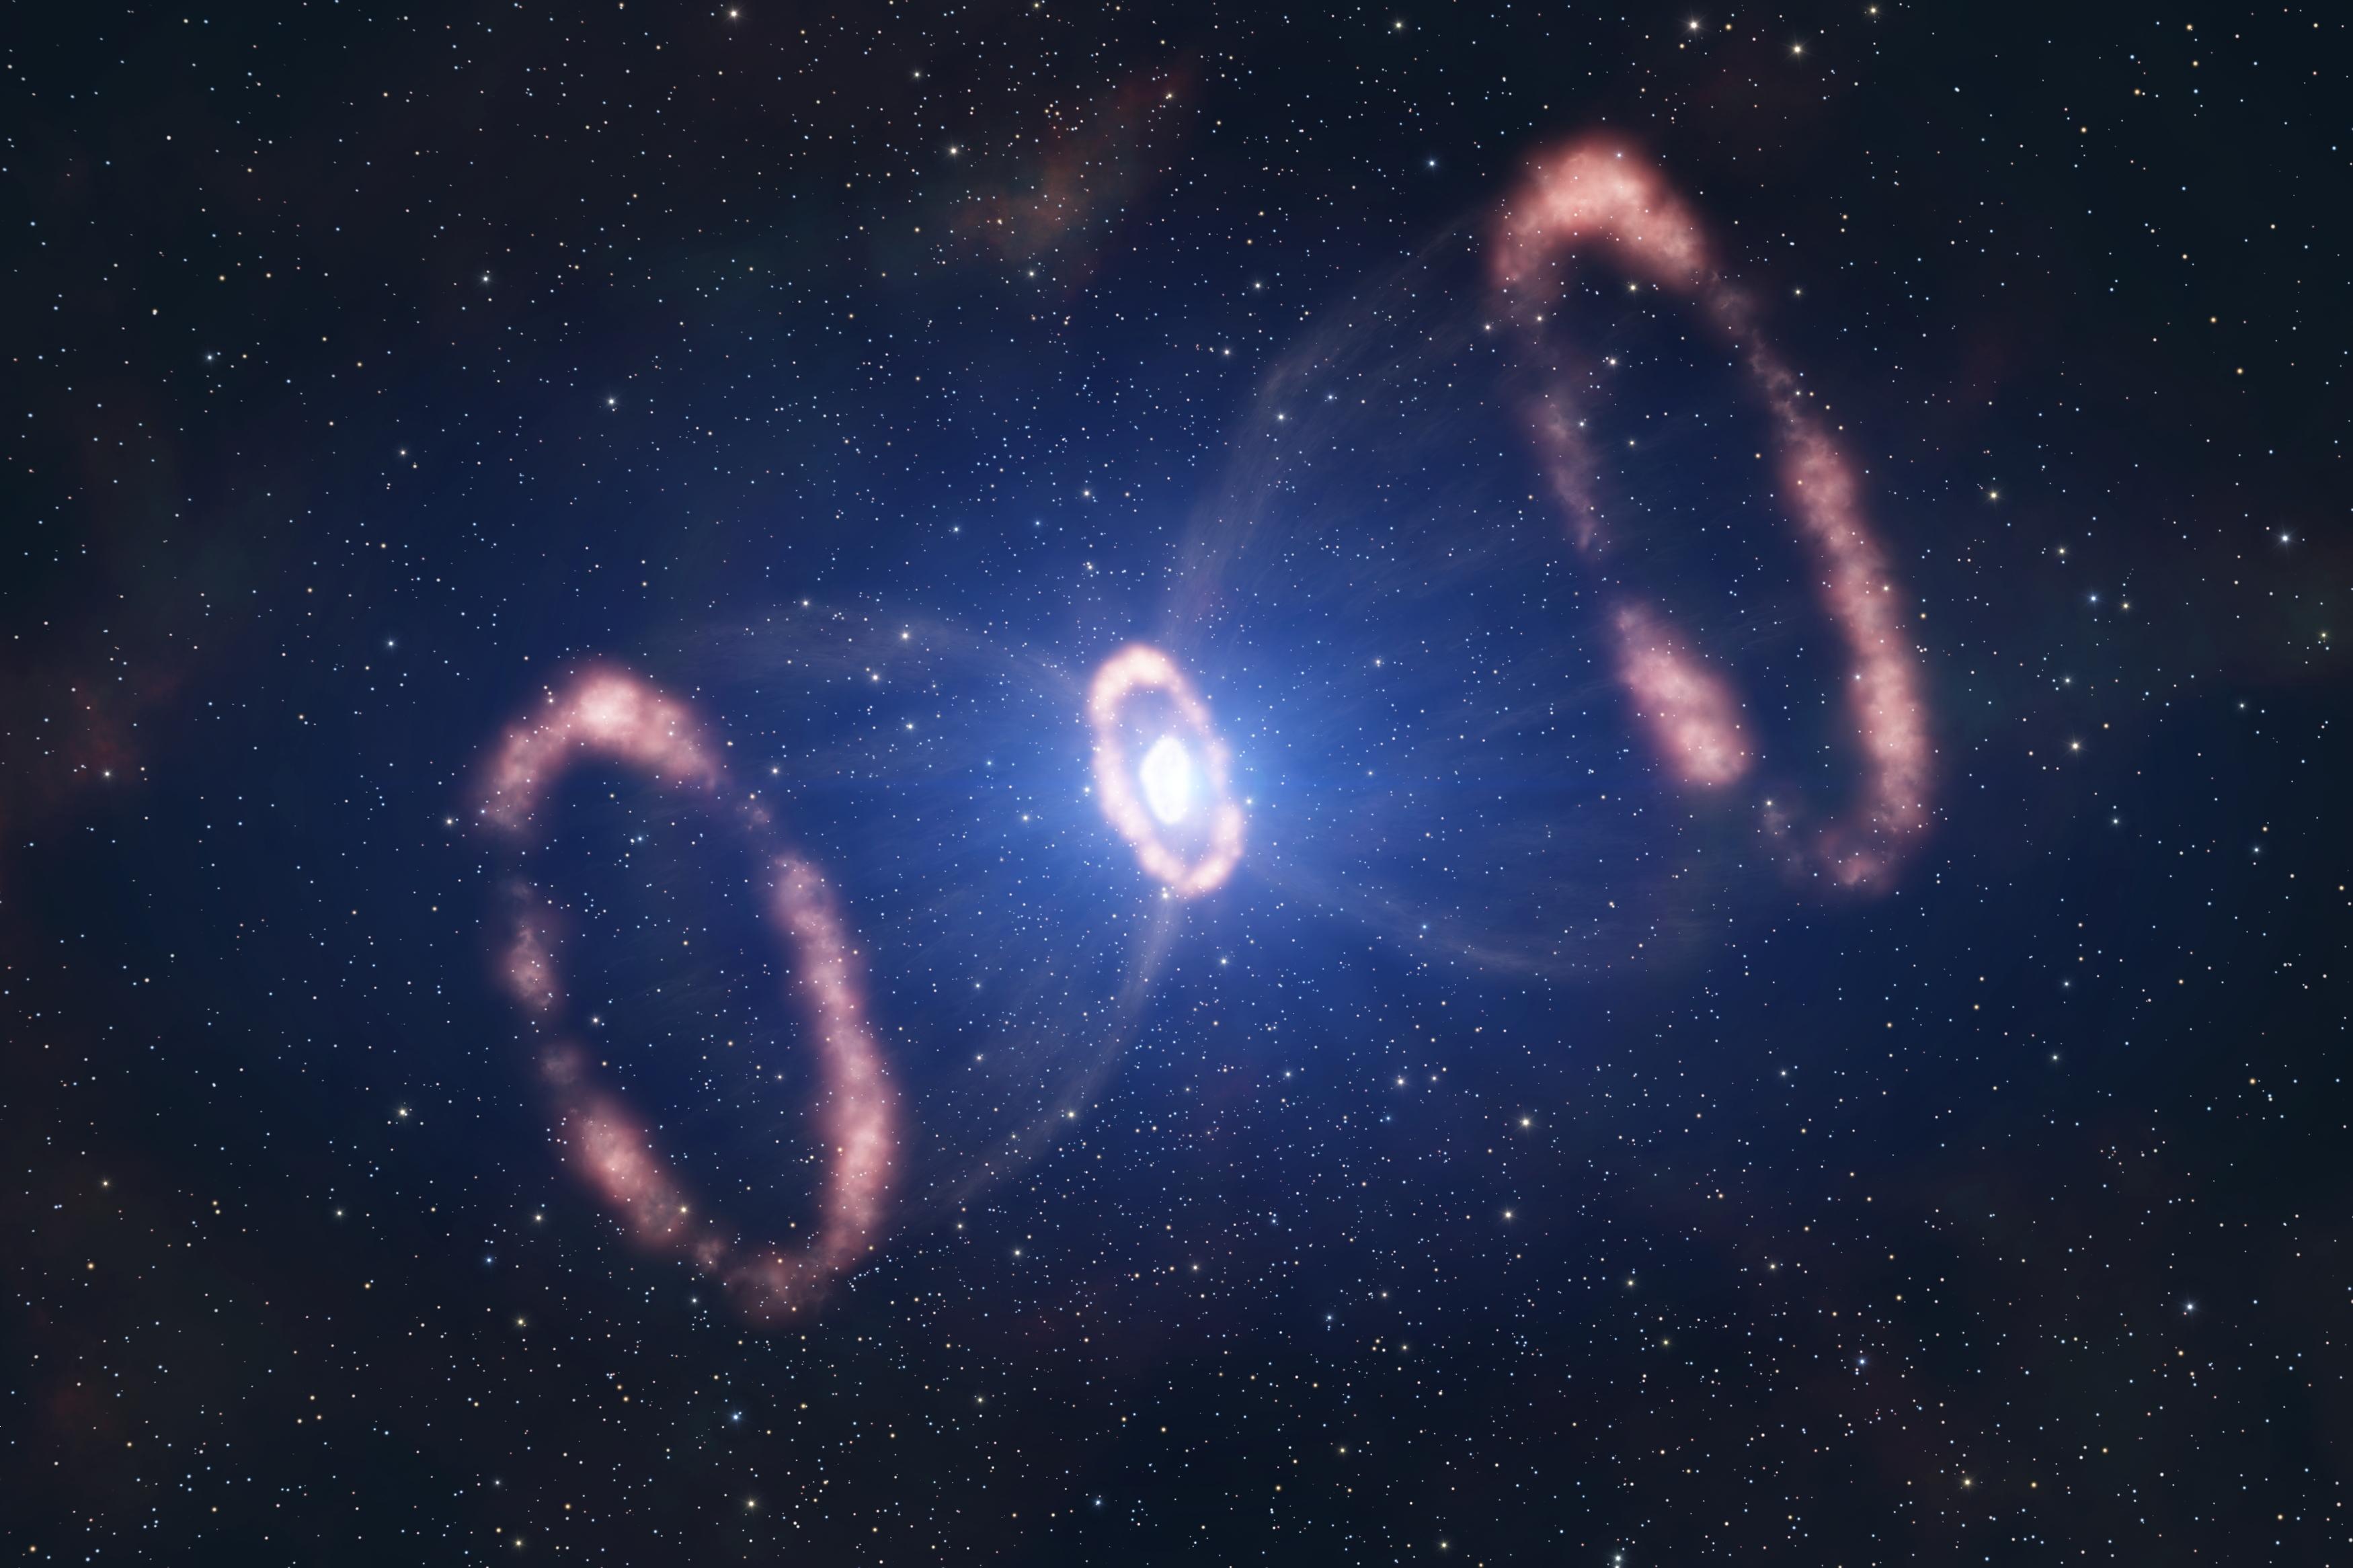 supernova Askipediacom 3500x2333